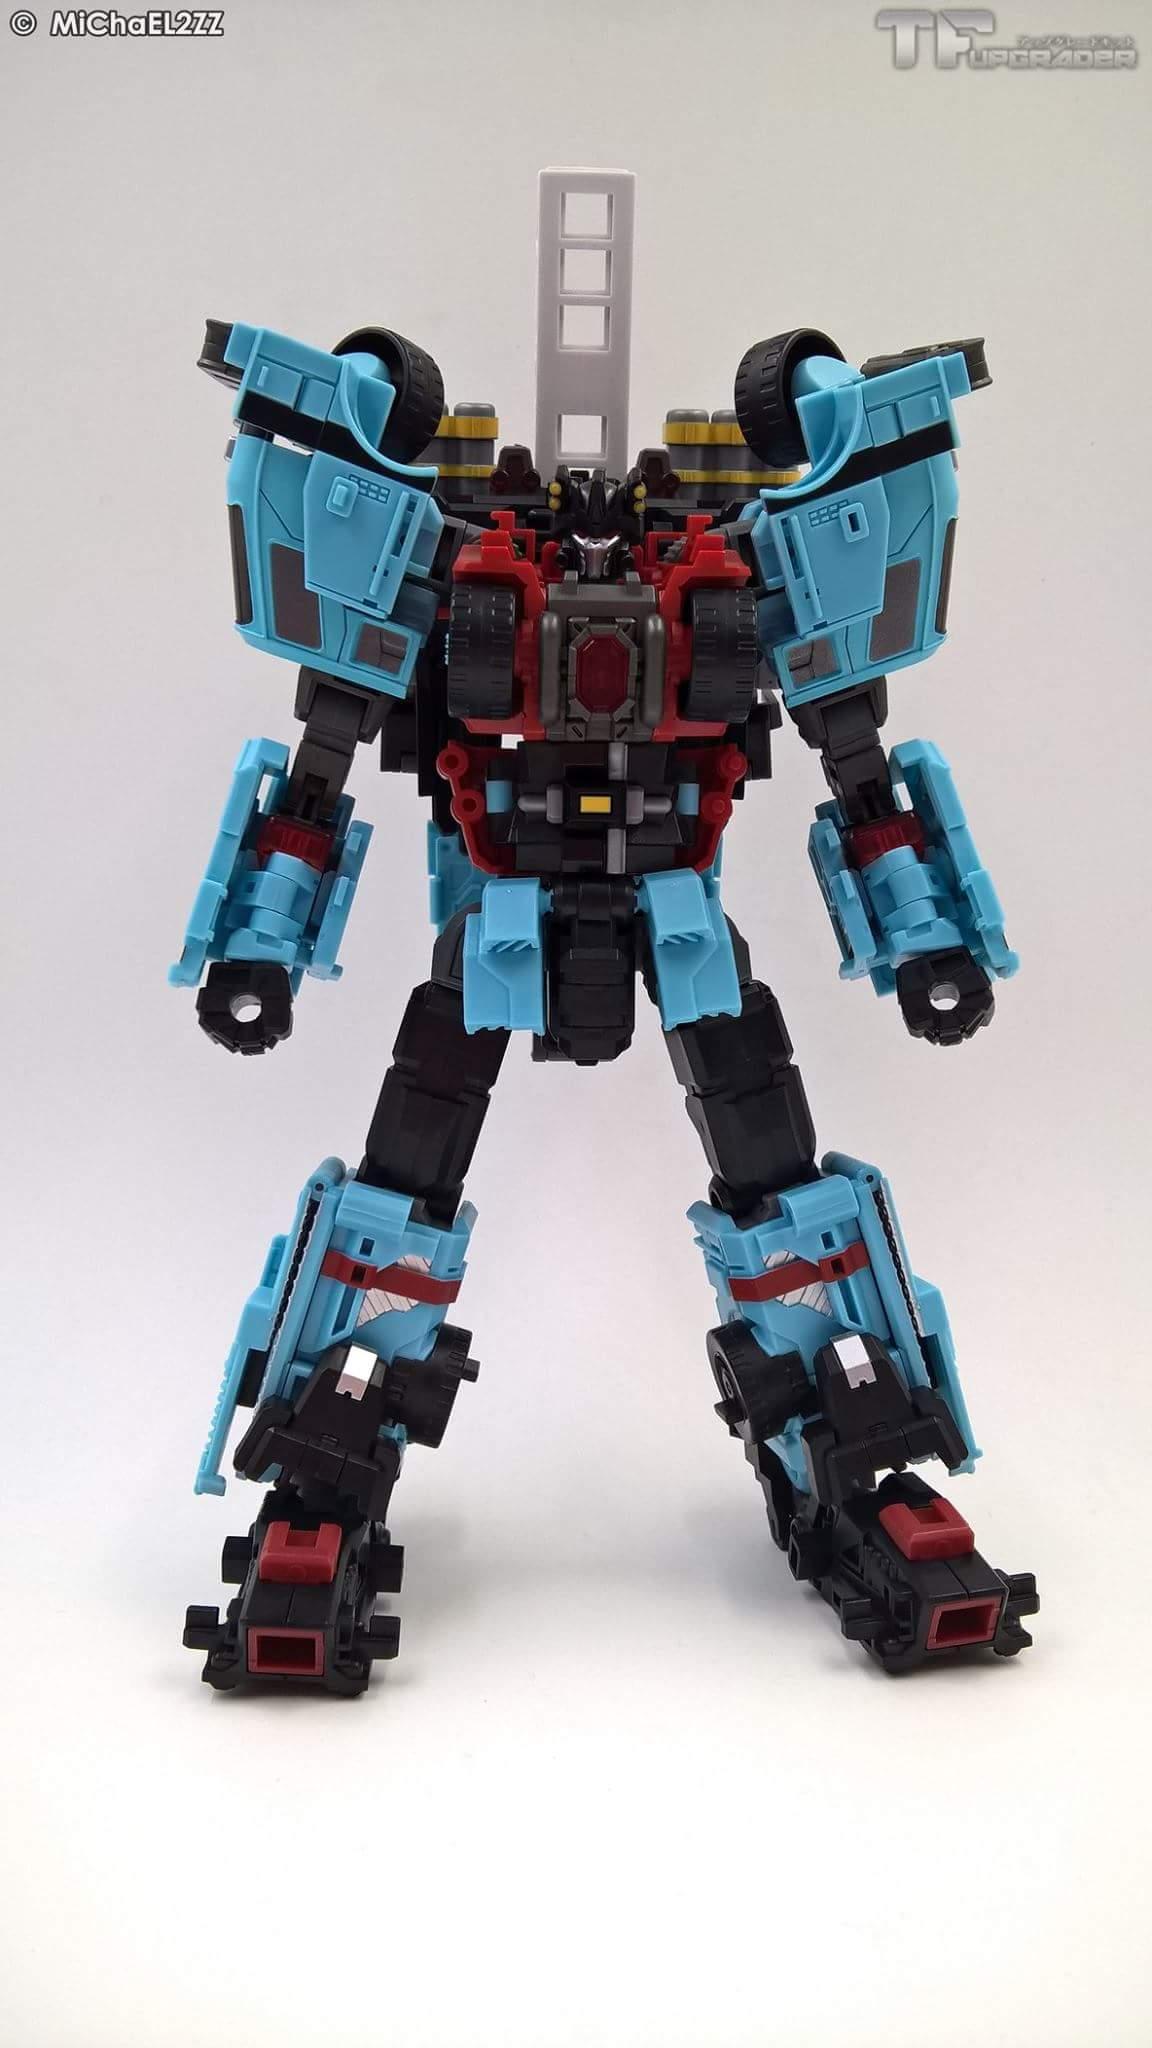 [MakeToys] Produit Tiers - Jouet MTCM-04 Guardia (aka Protectobots - Defensor/Defenso) - Page 4 OKpAaCkF